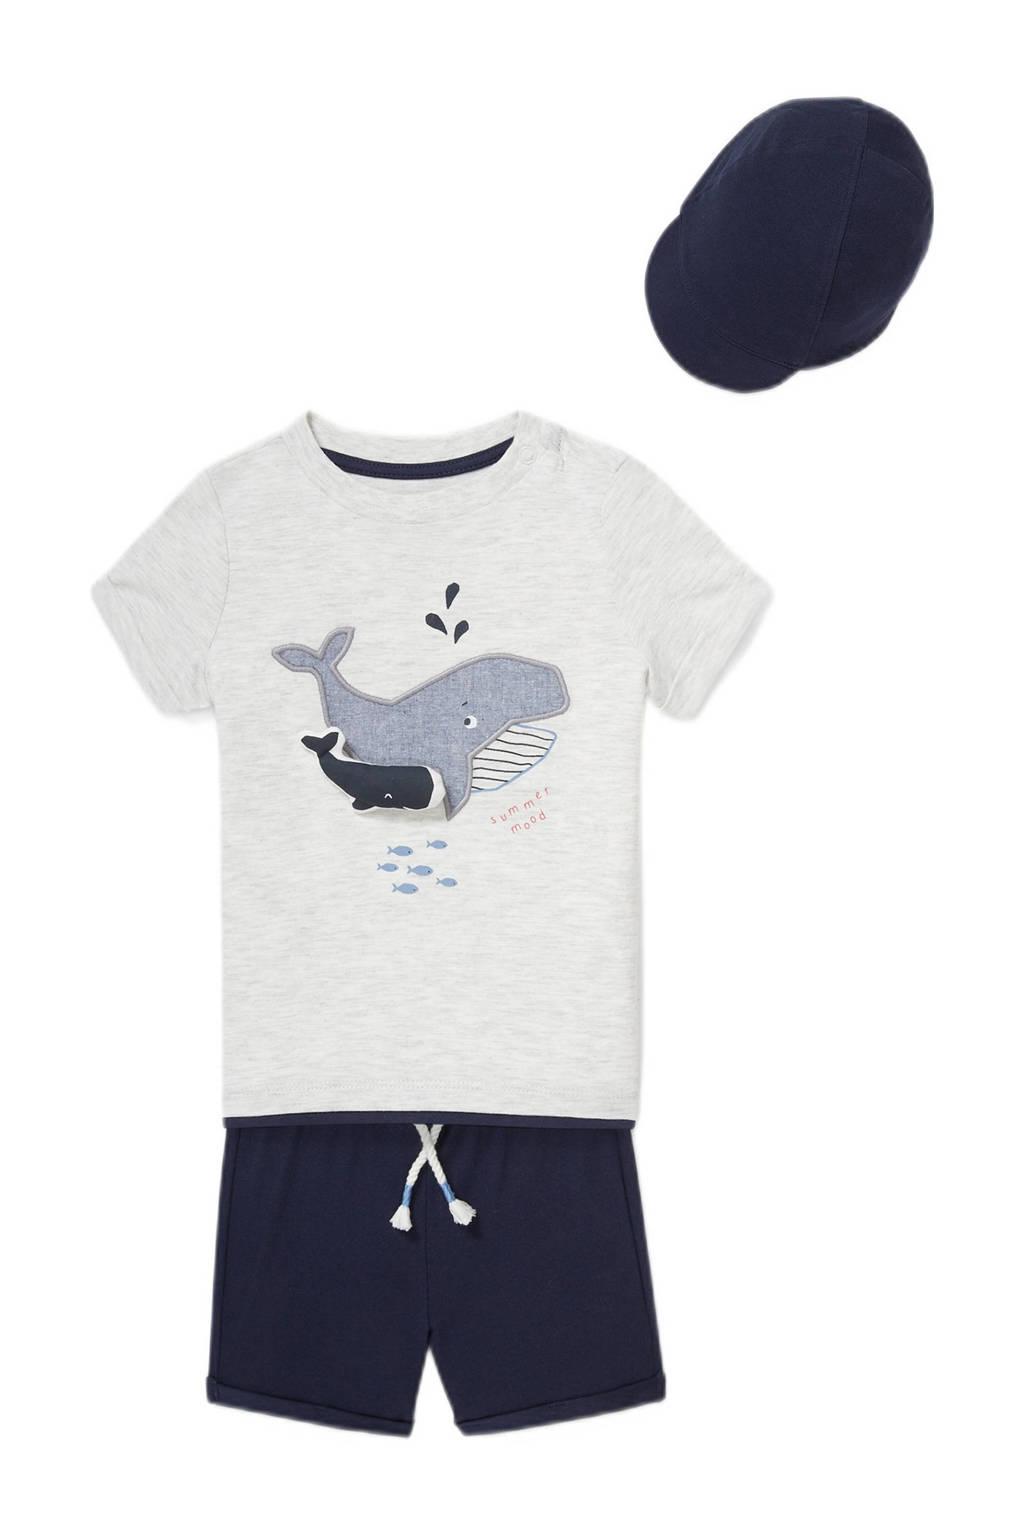 C&A Baby Club T-shirt + korte broek + pet donkerblauw/wit, Donkerblauw/grijs